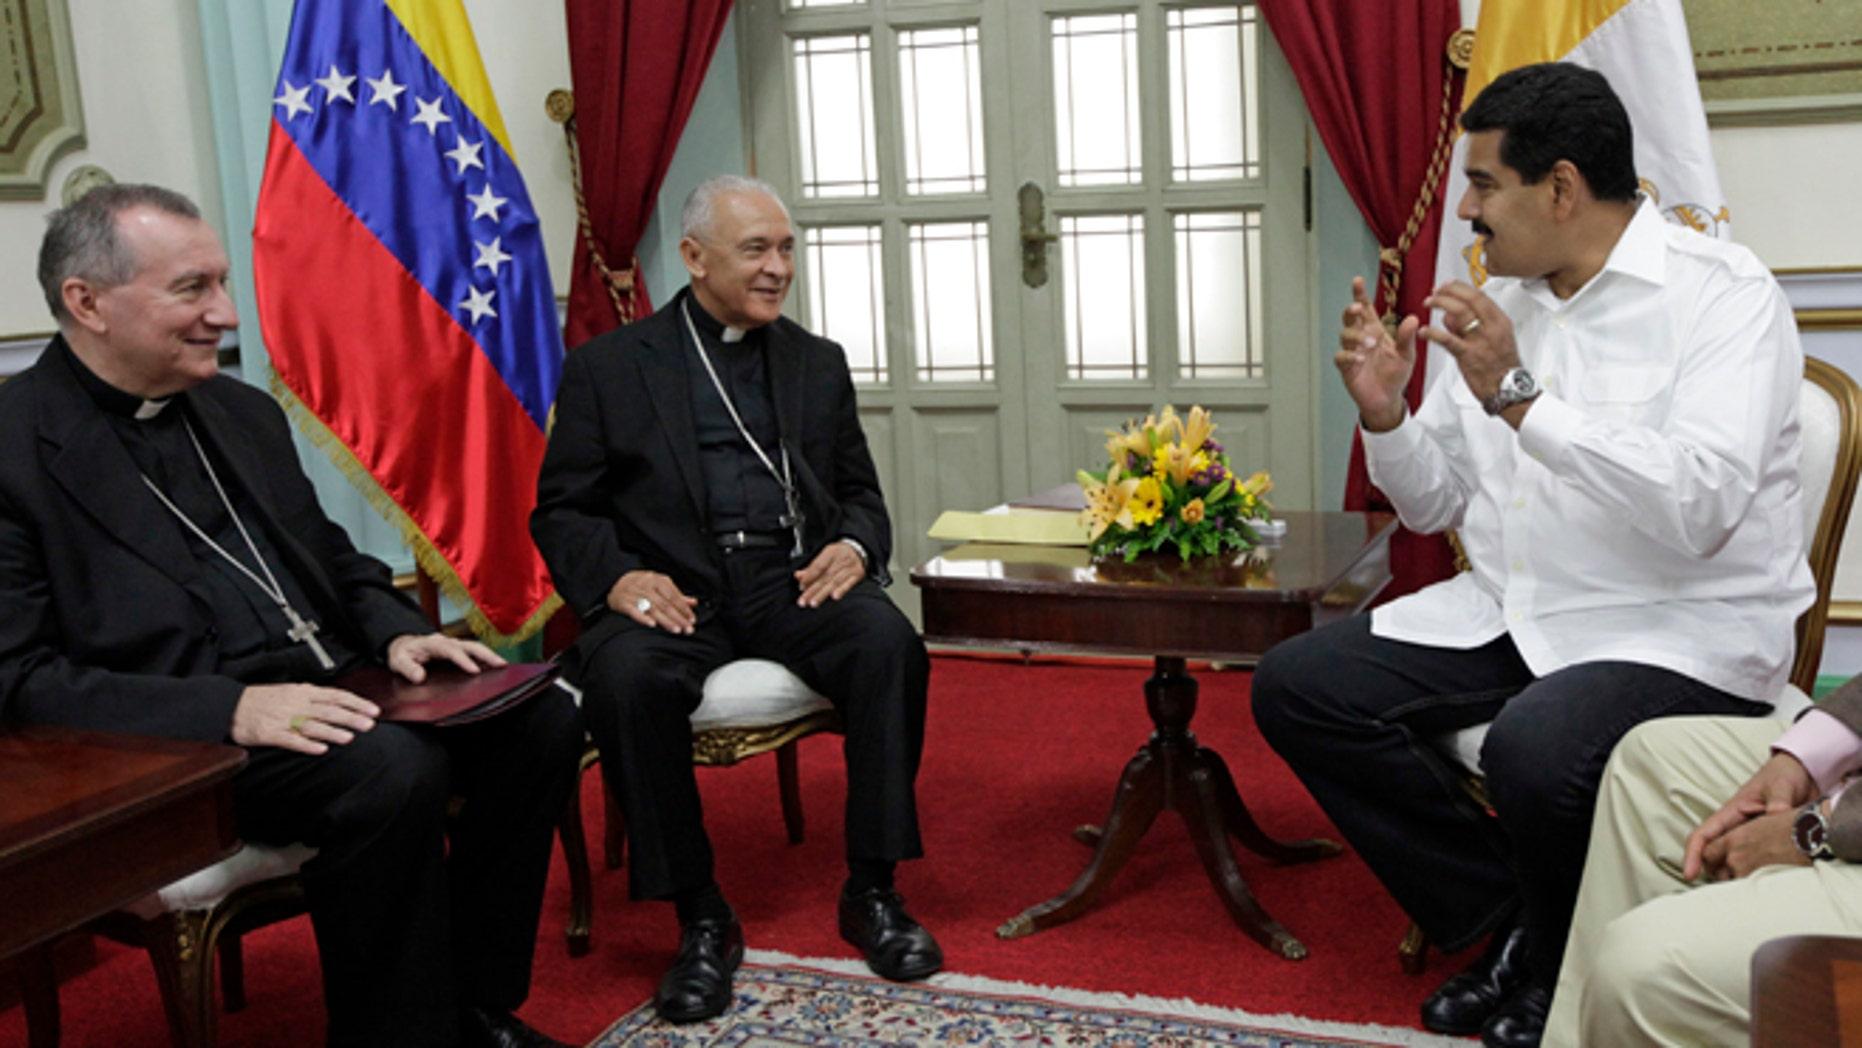 June 14, 2013: In thisphoto, Venezuela's President Nicolas Maduro, right, meets with Venezuela's Archbishop Diego Rafael Padron Sanchez, left and Italian Pietro Parolin, Holy See's representative in Venezuela, at Miraflores presidential palace in Caracas, Venezuela.